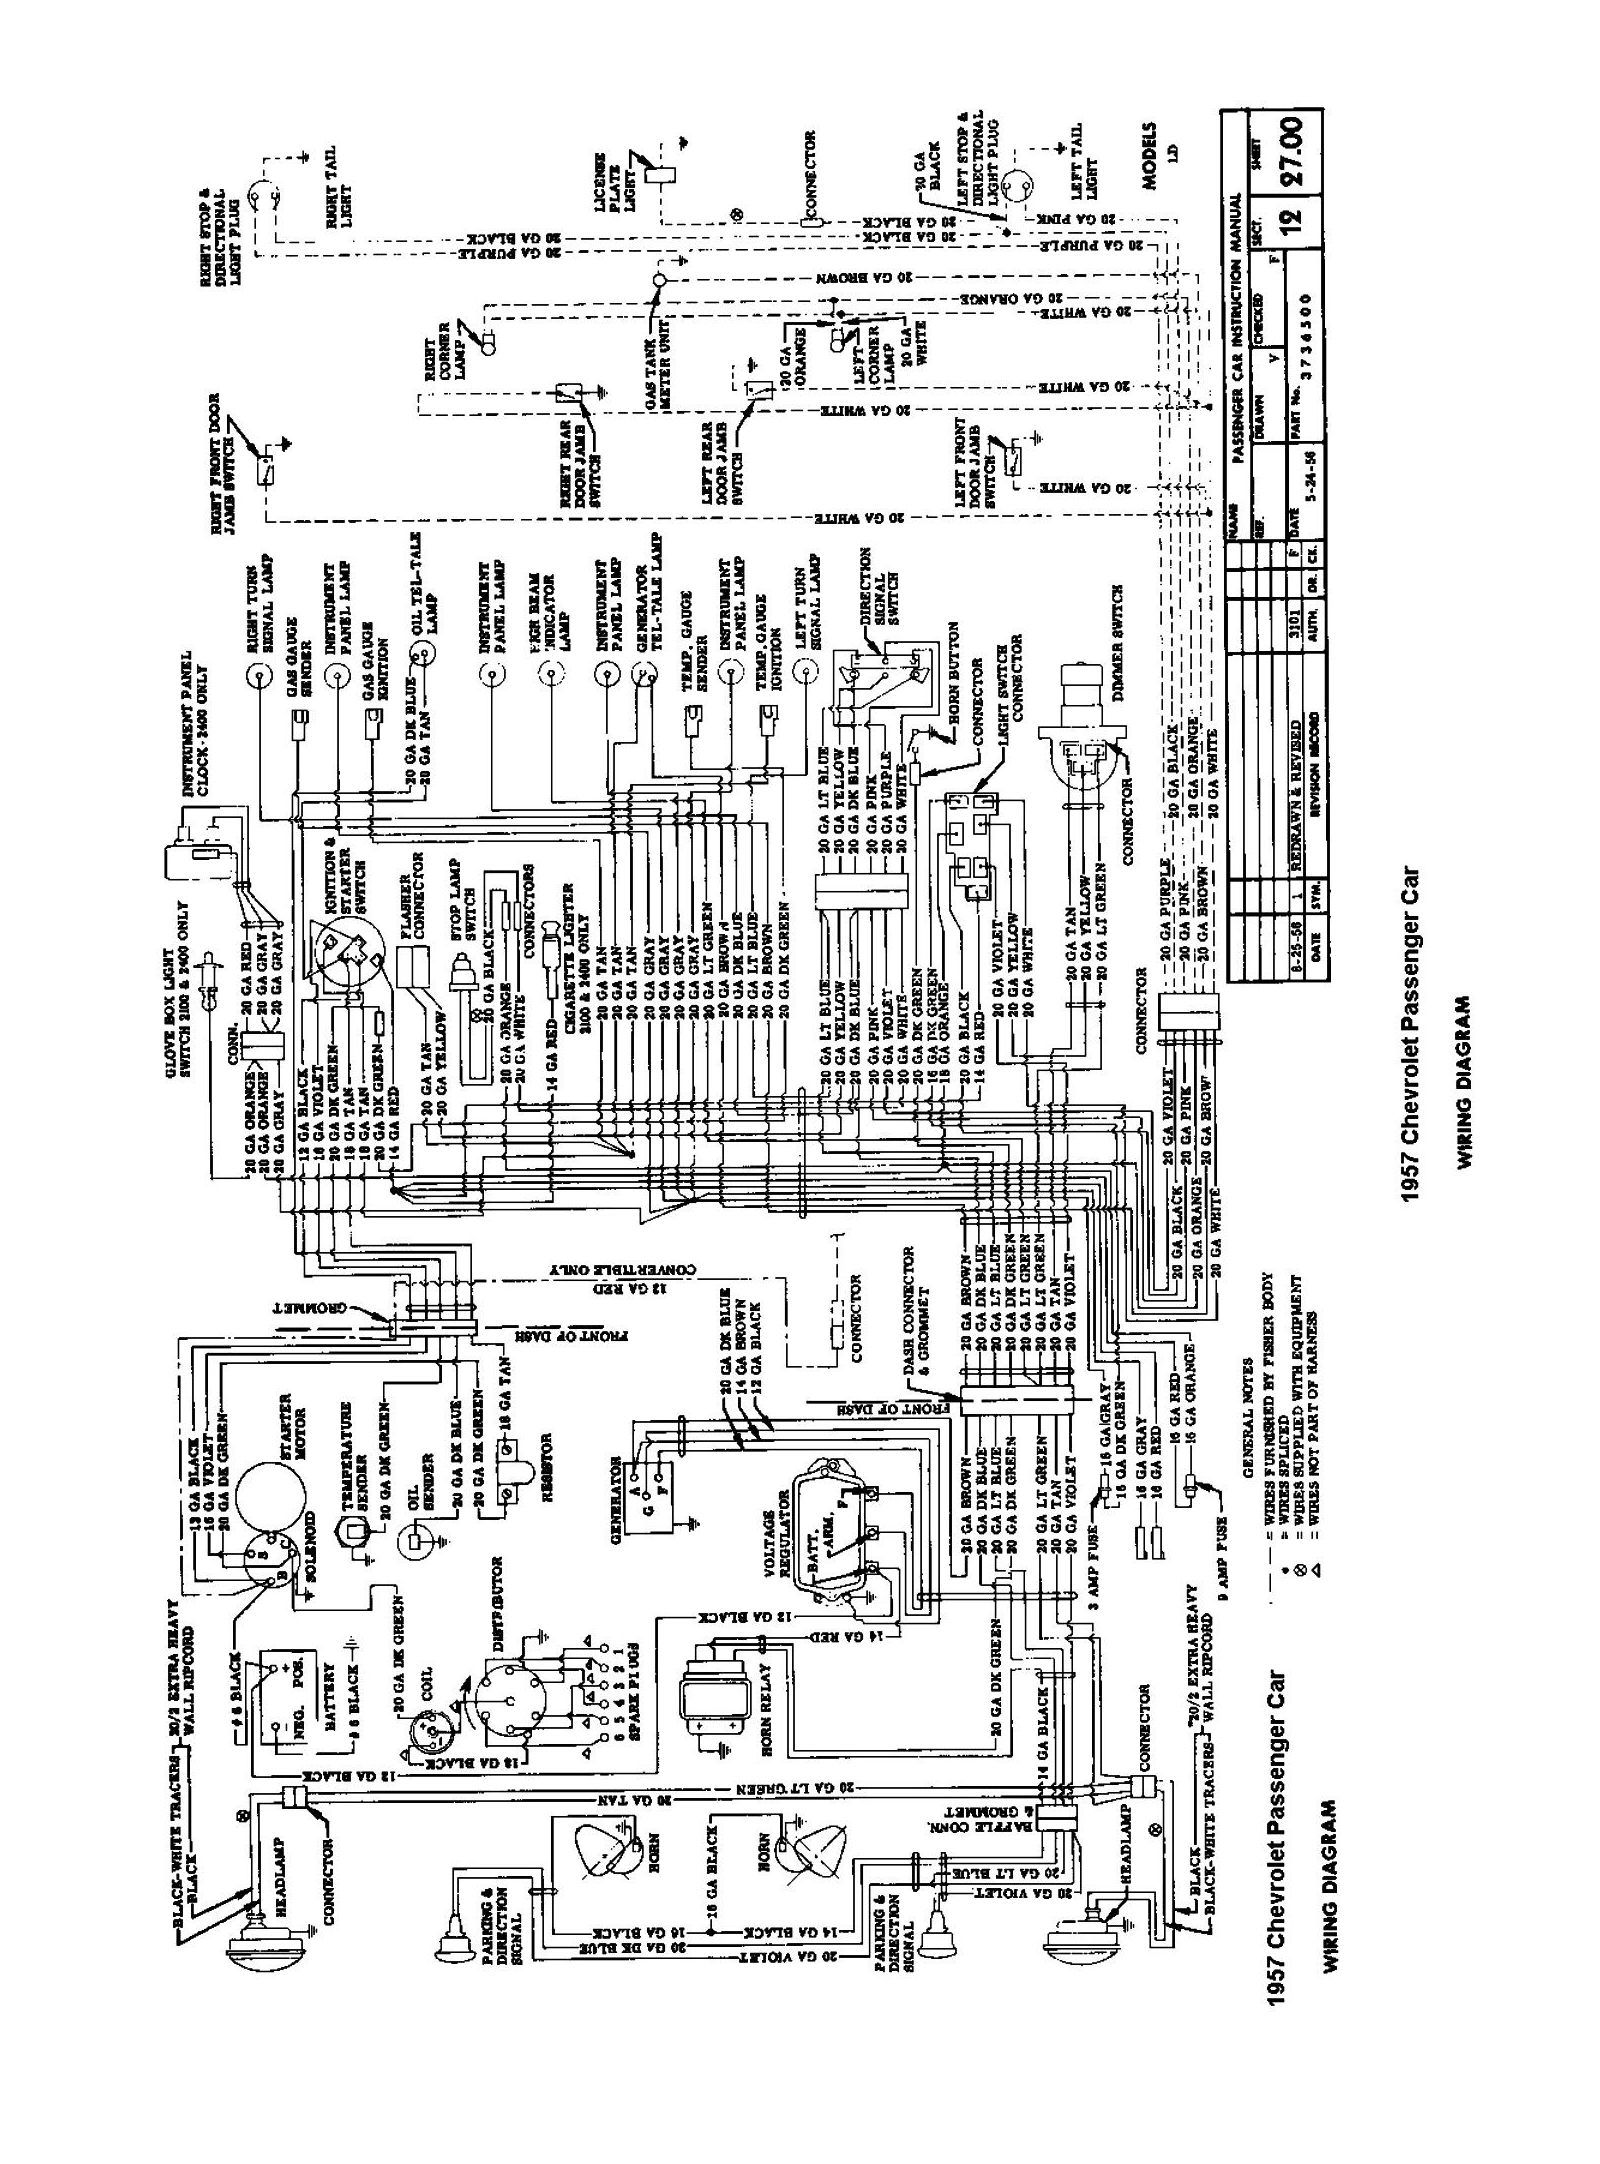 Diagram Dimarzio Evolution Pickup Wiring Diagram Full Version Hd Quality Wiring Diagram Sitexlerch Lucaolivieri It